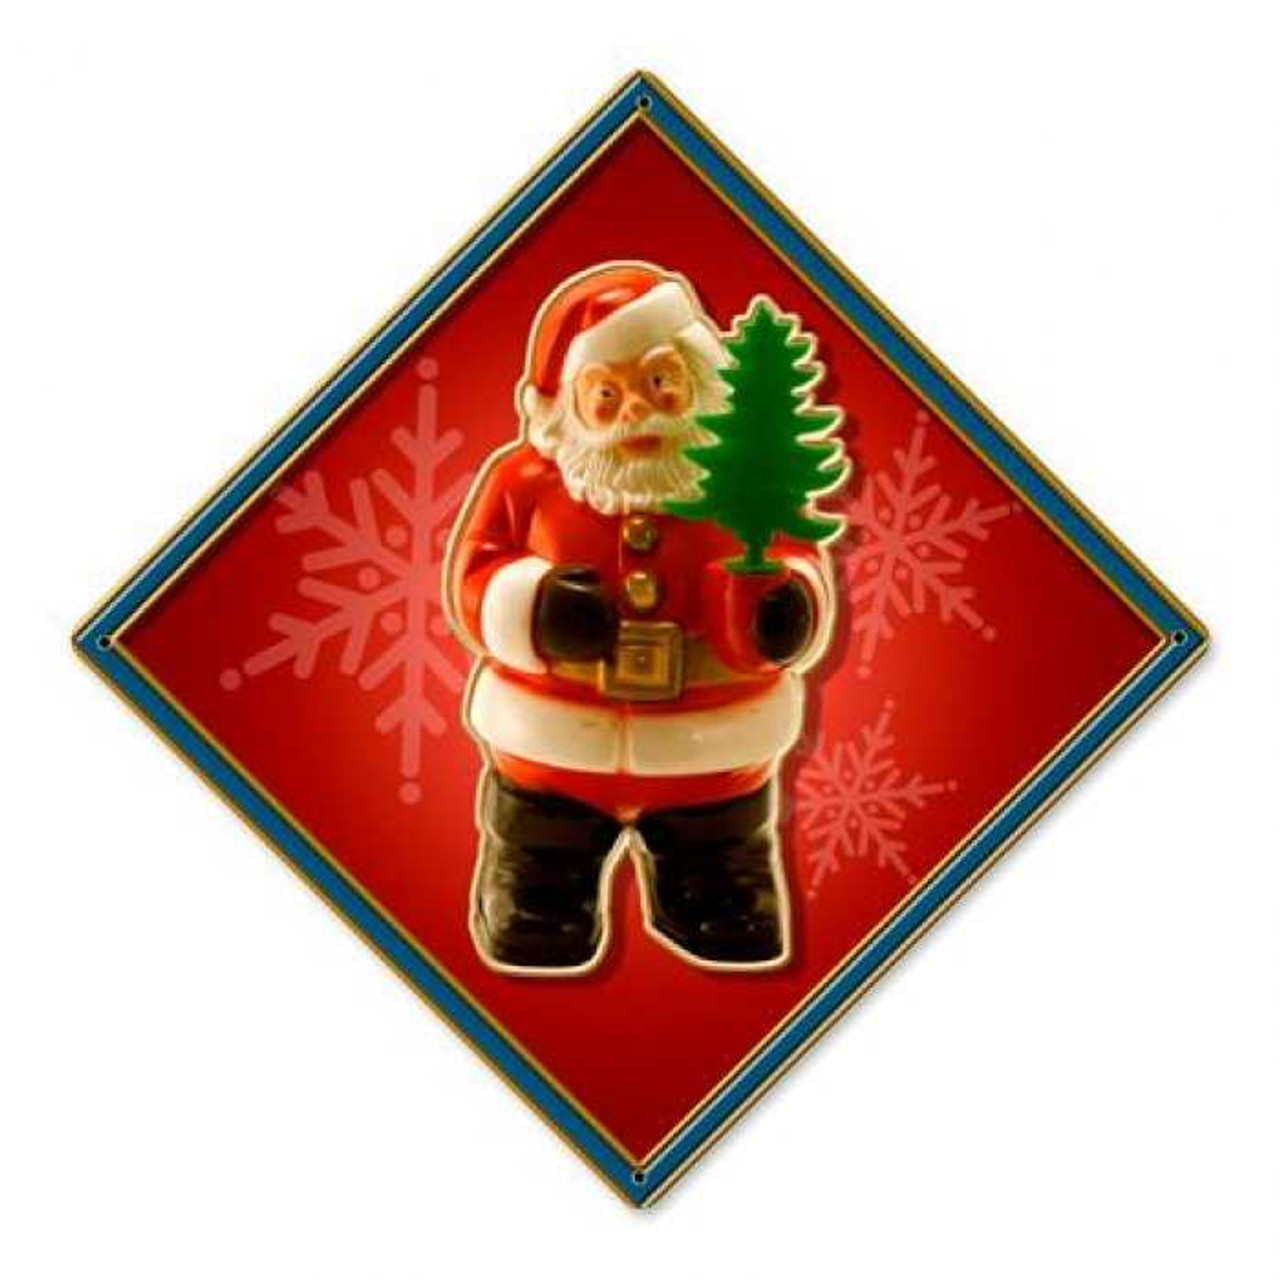 Vintage Santa Tree Metal Sign 12 x 12 Inches